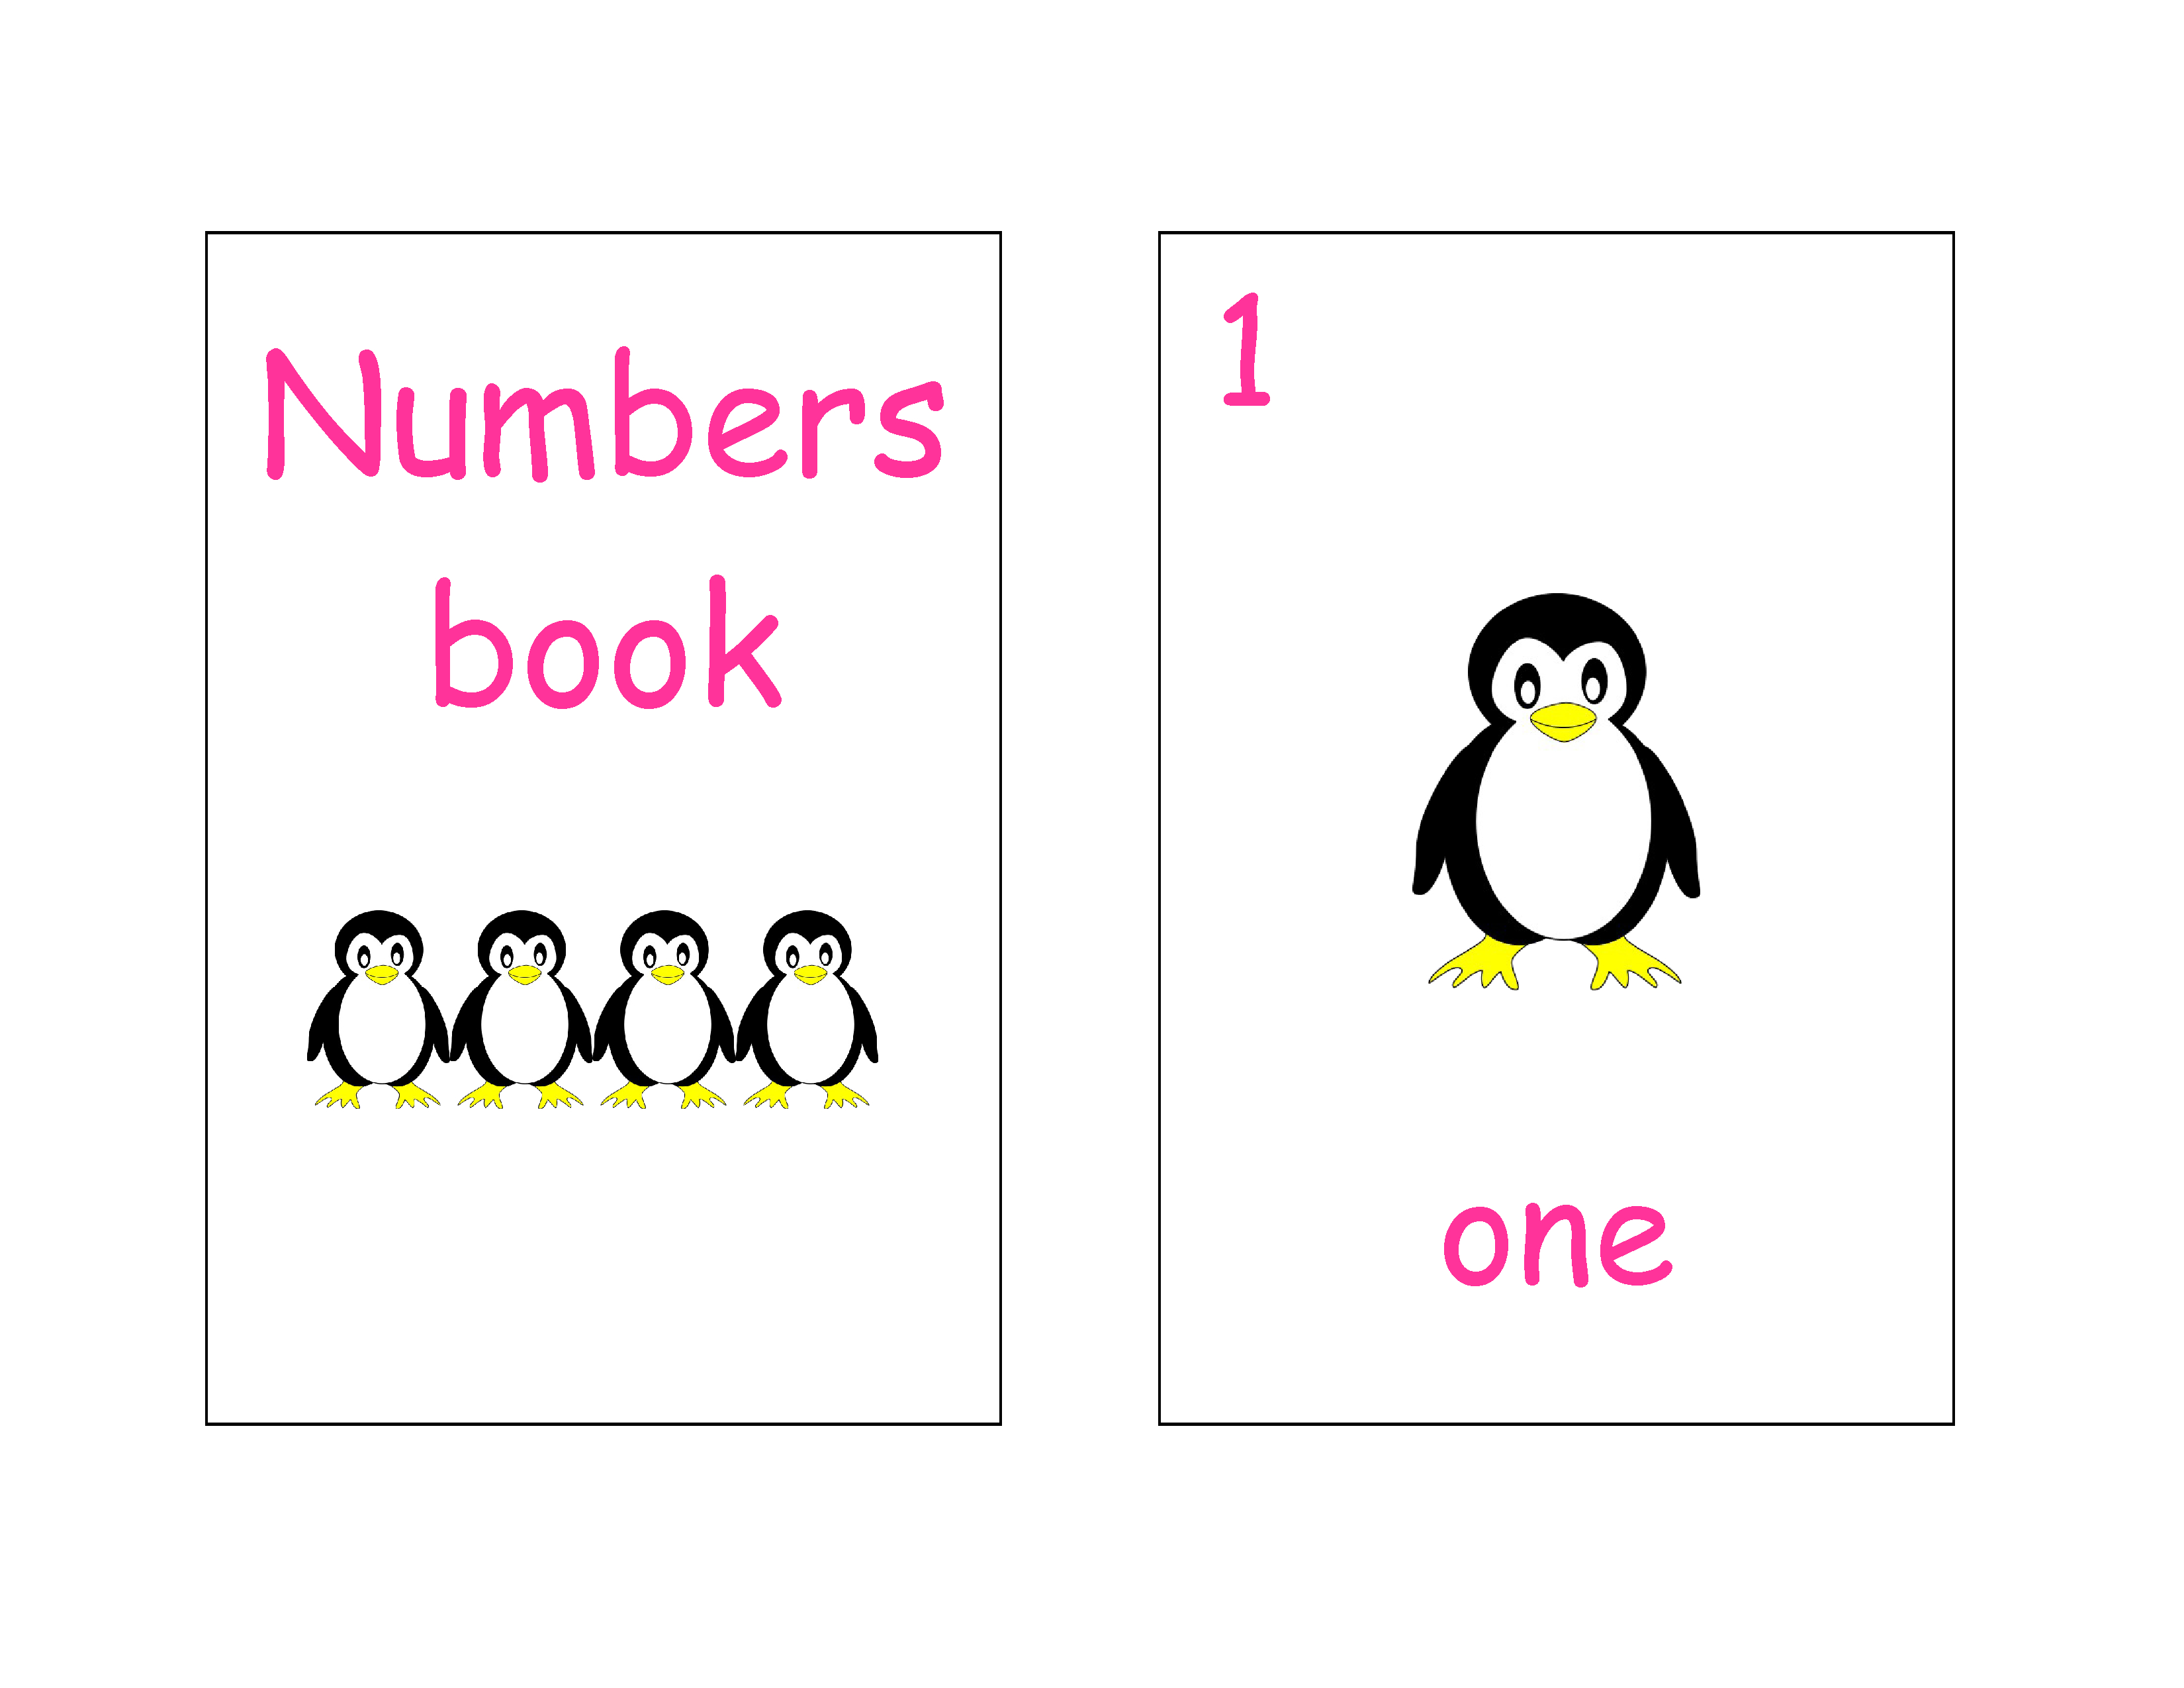 Pinplayingtots On Free Printable Mini Books / Worksheets | Quiet - Free Printable Penguin Books